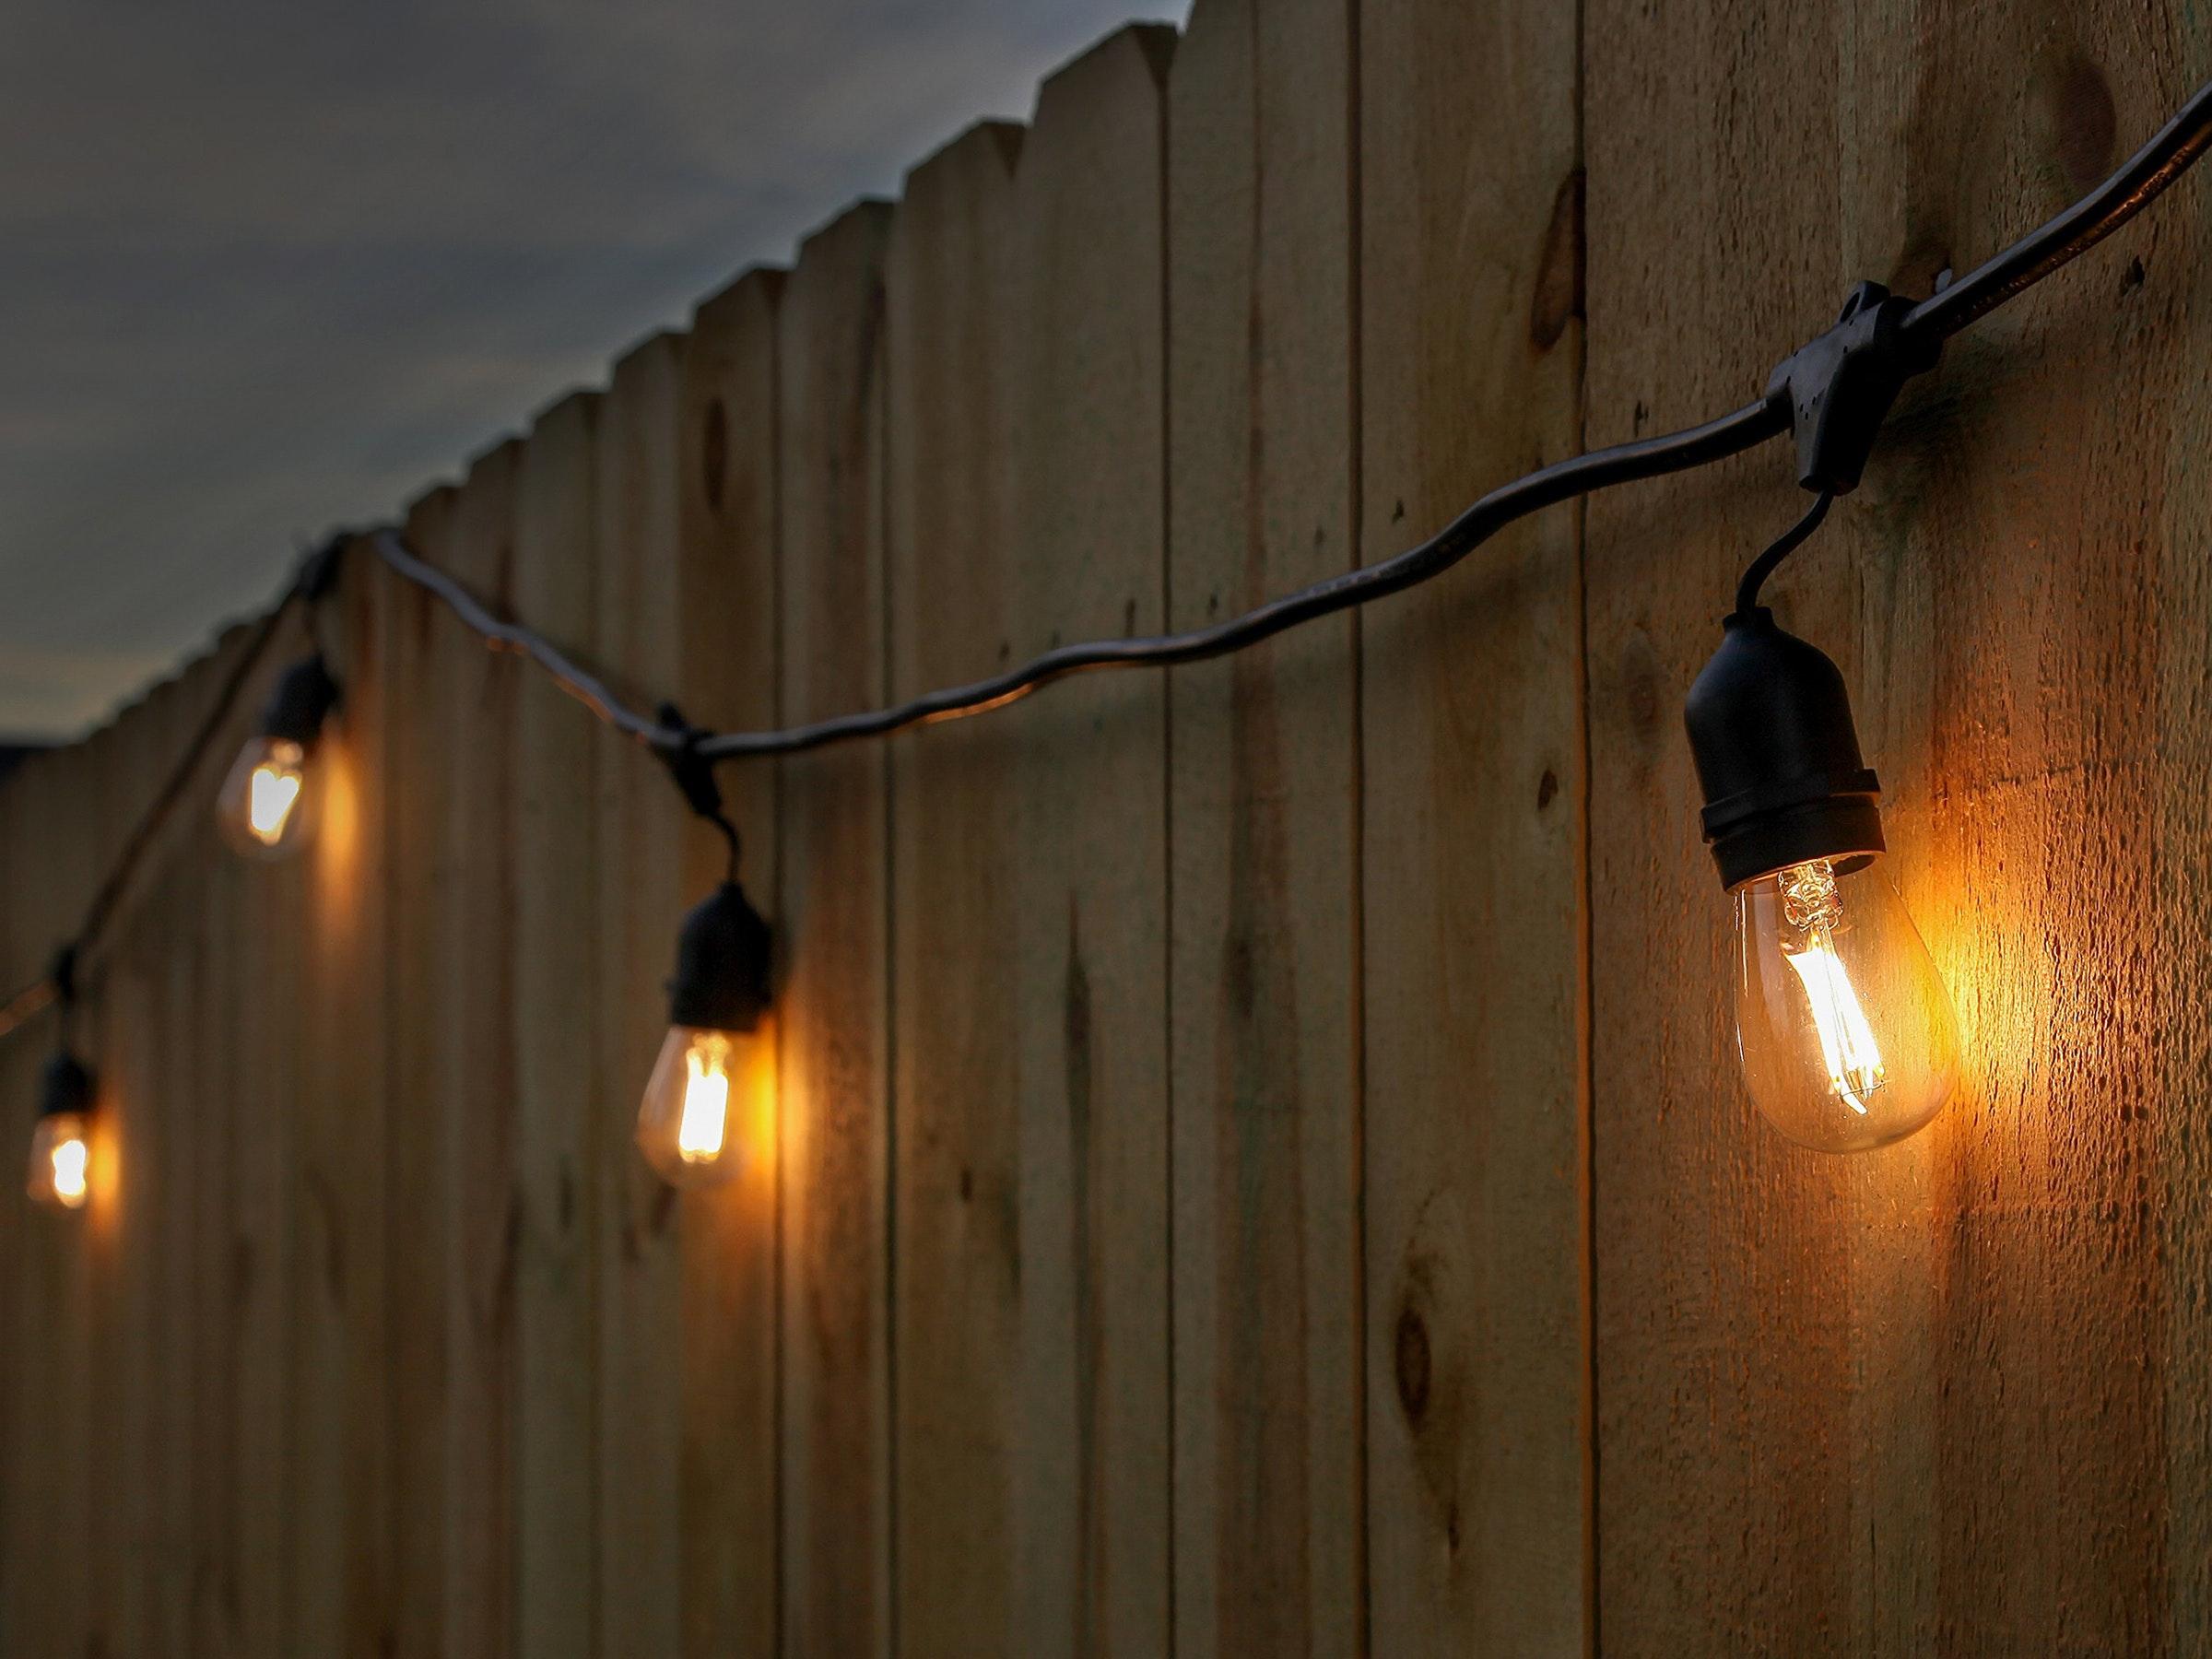 Festoon Lights LED 15m with 24 Filament Bulbs